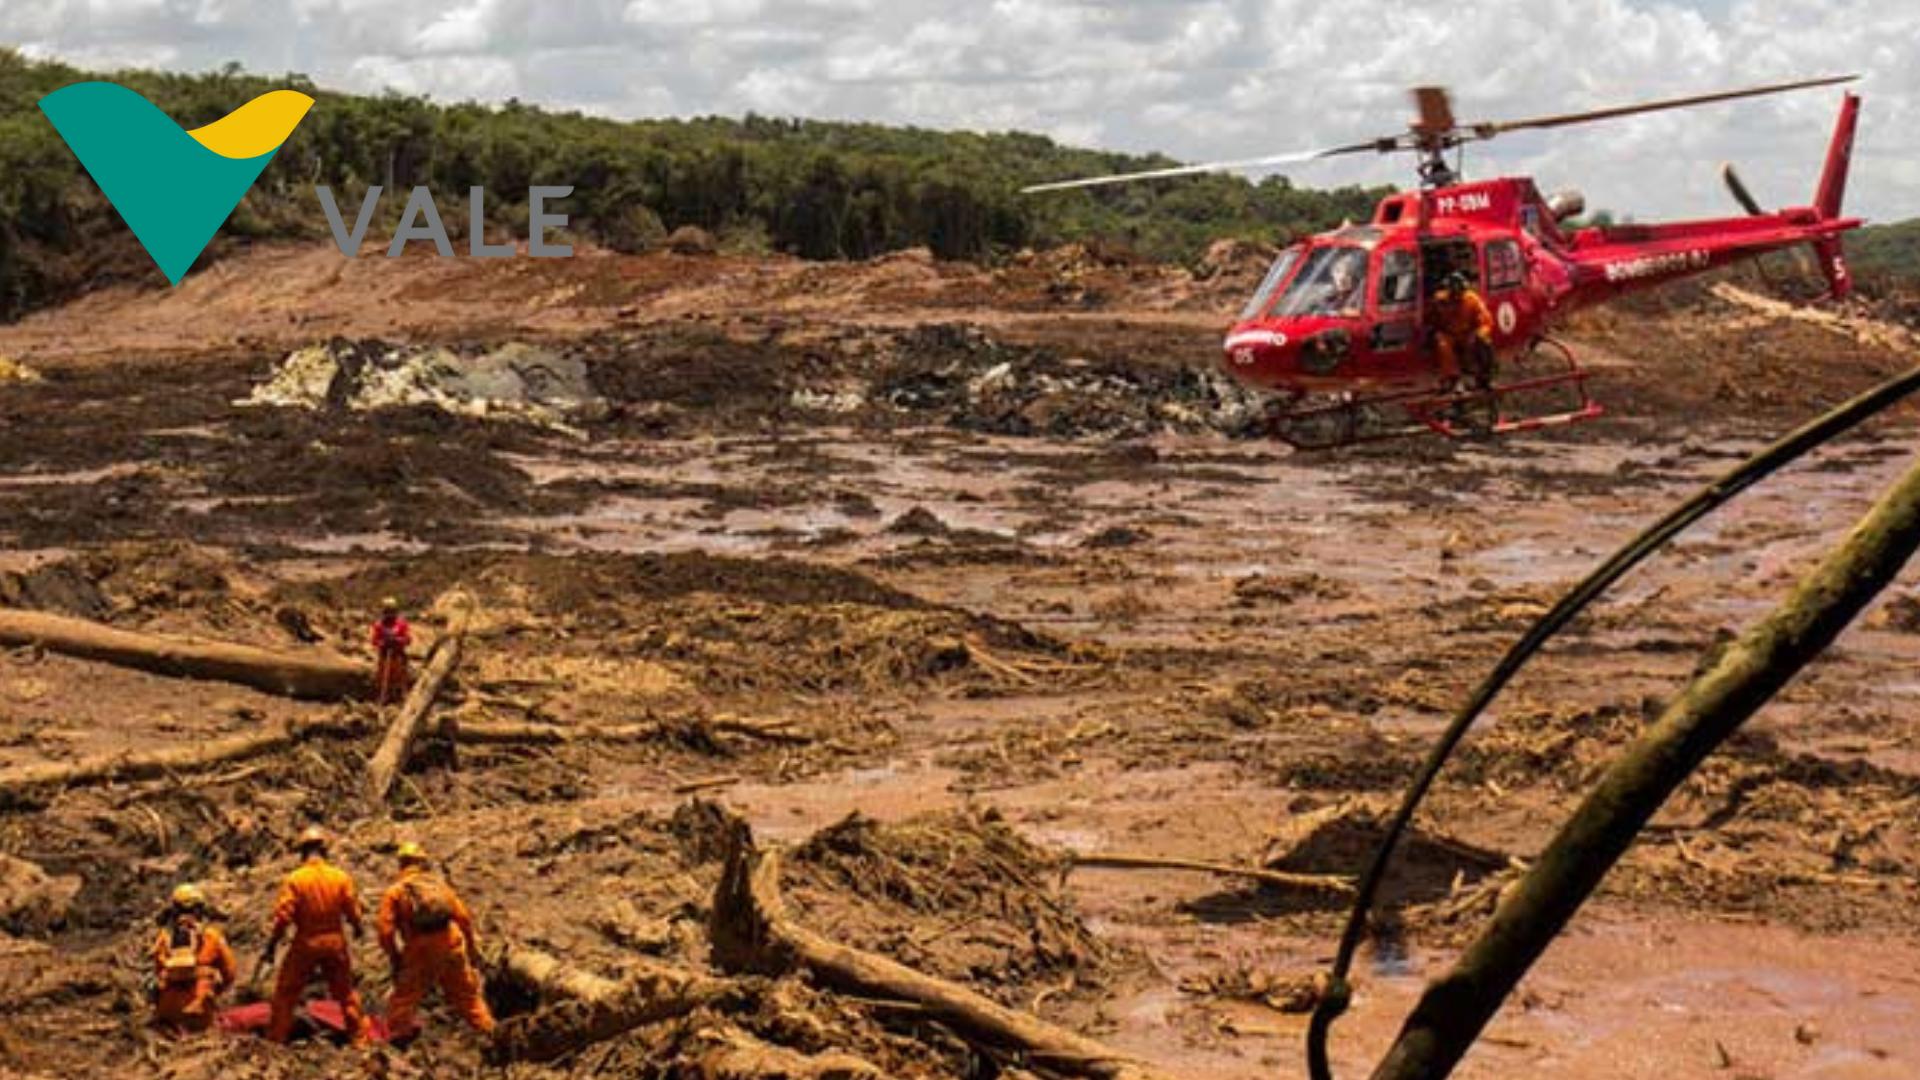 Vale – Mineradora - Brumadinho – Minas Gerais